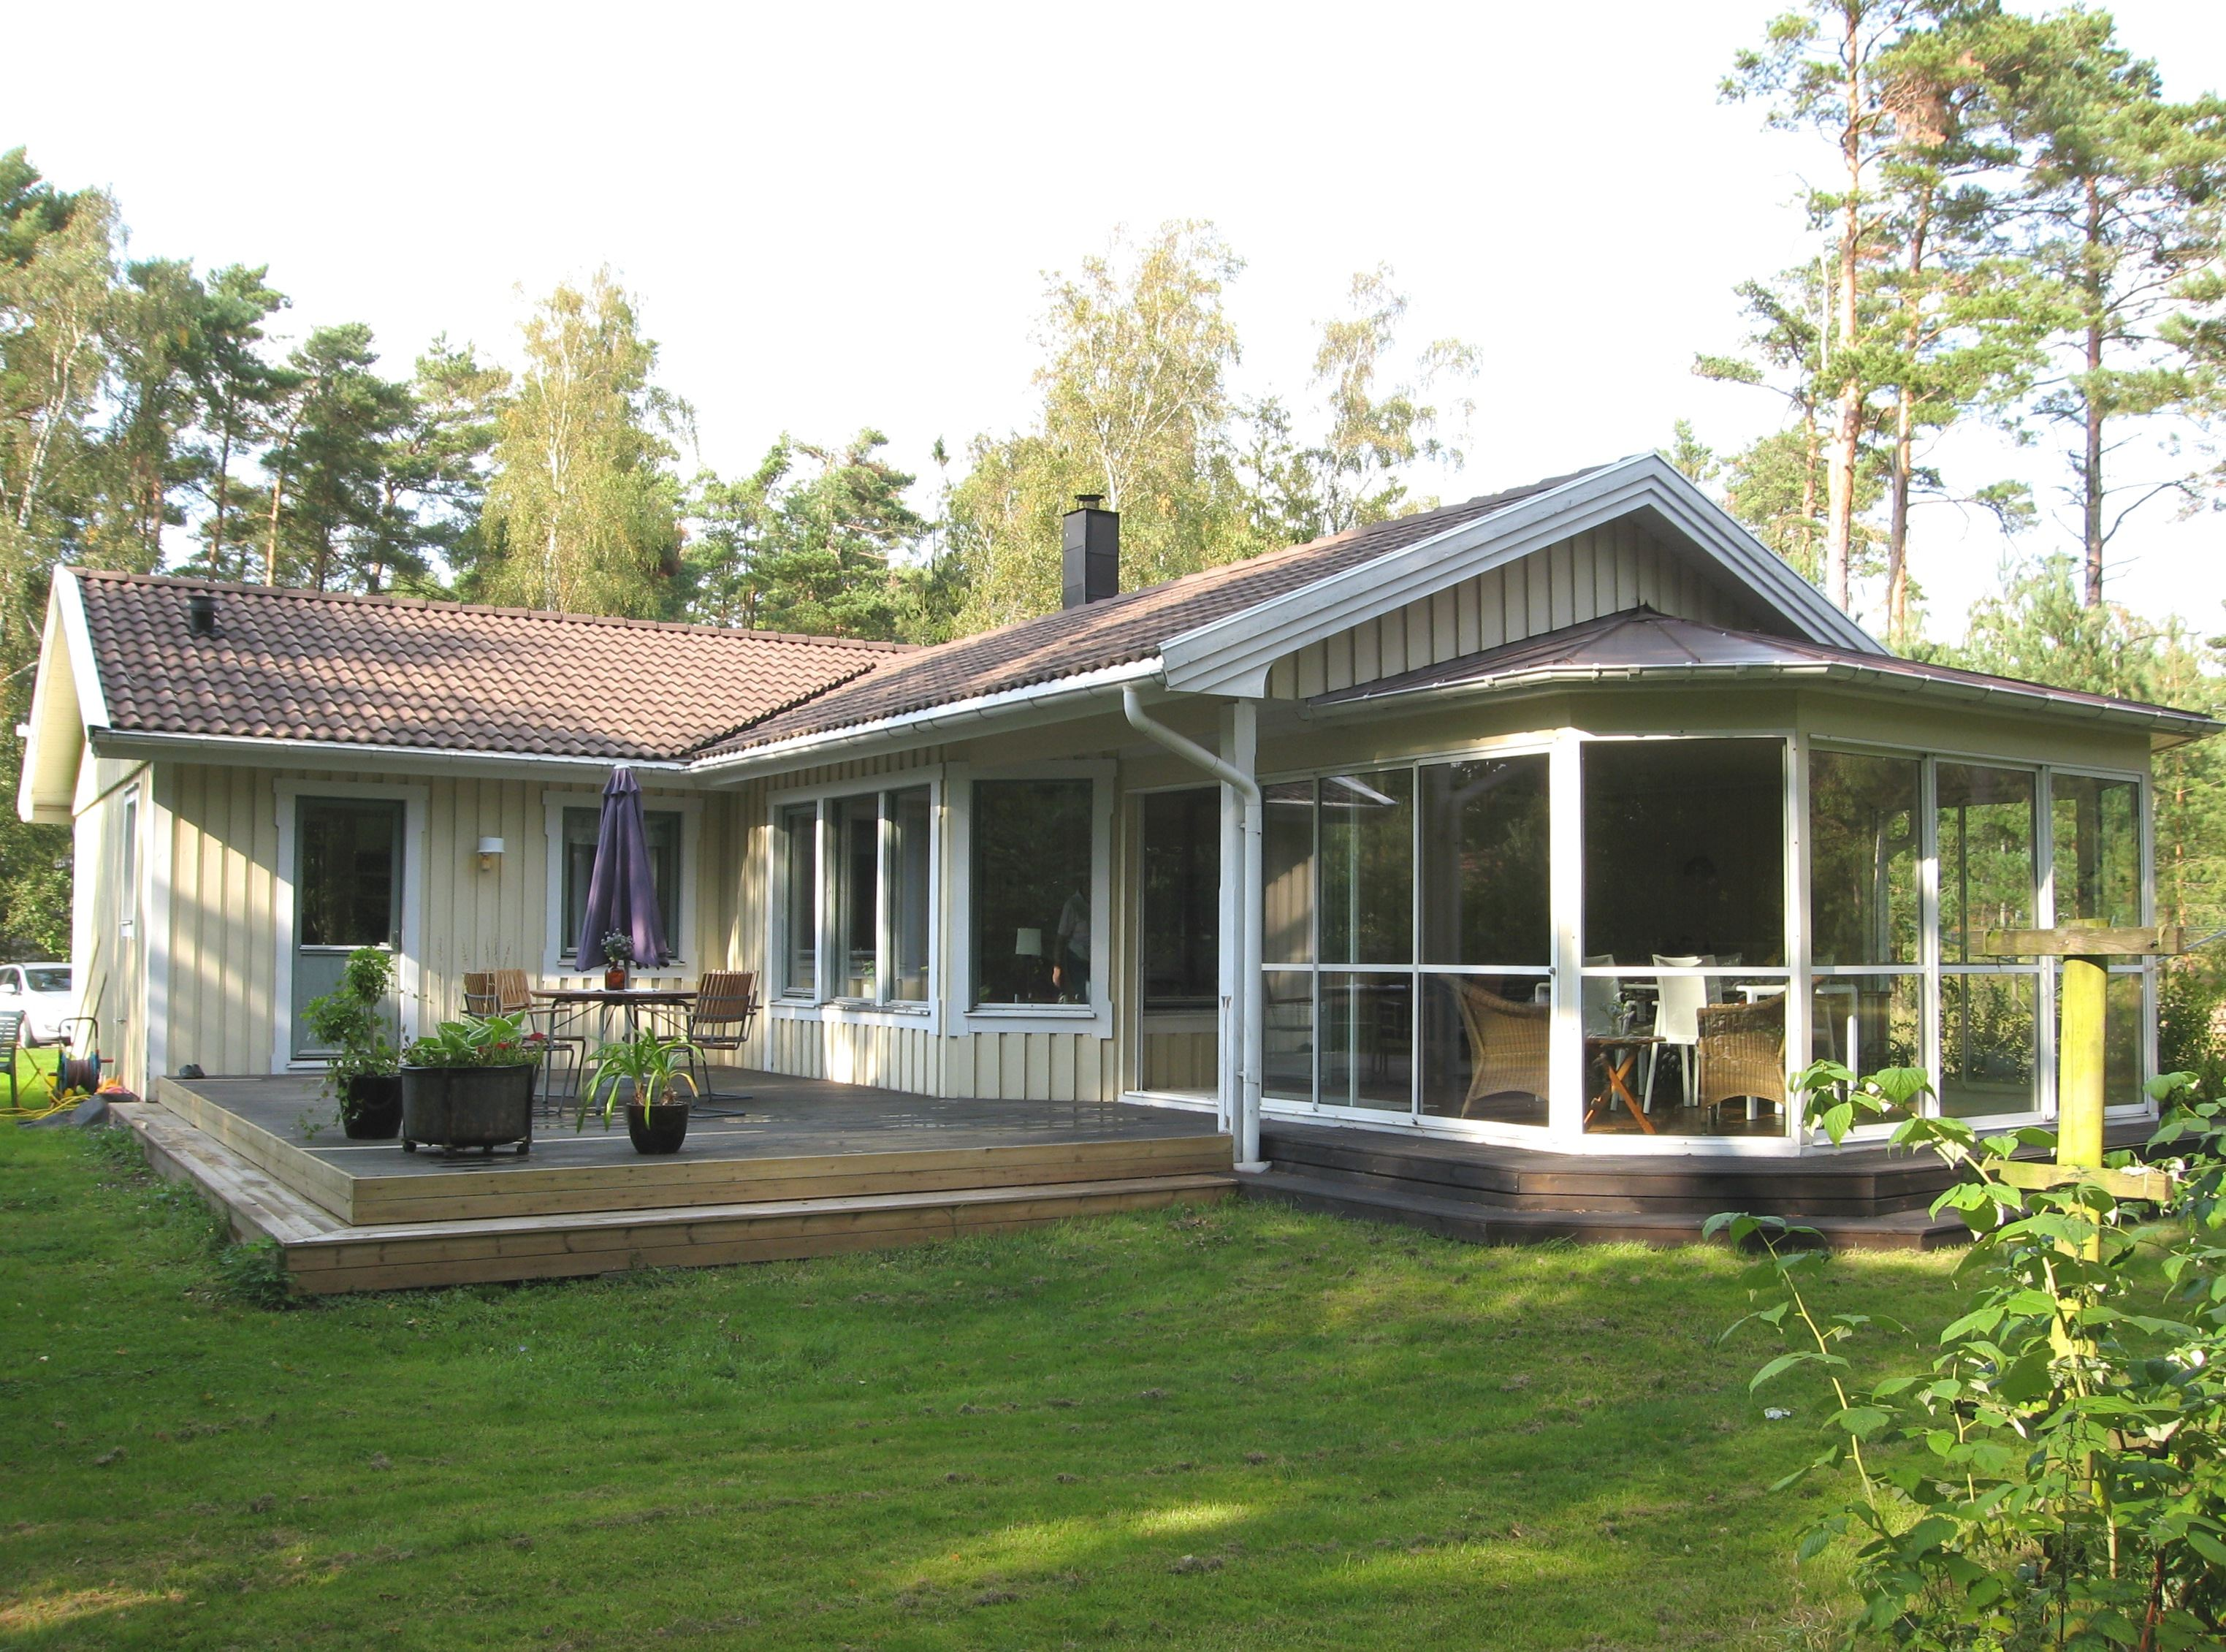 EN8003 Glimminge Plantering, Bjäre